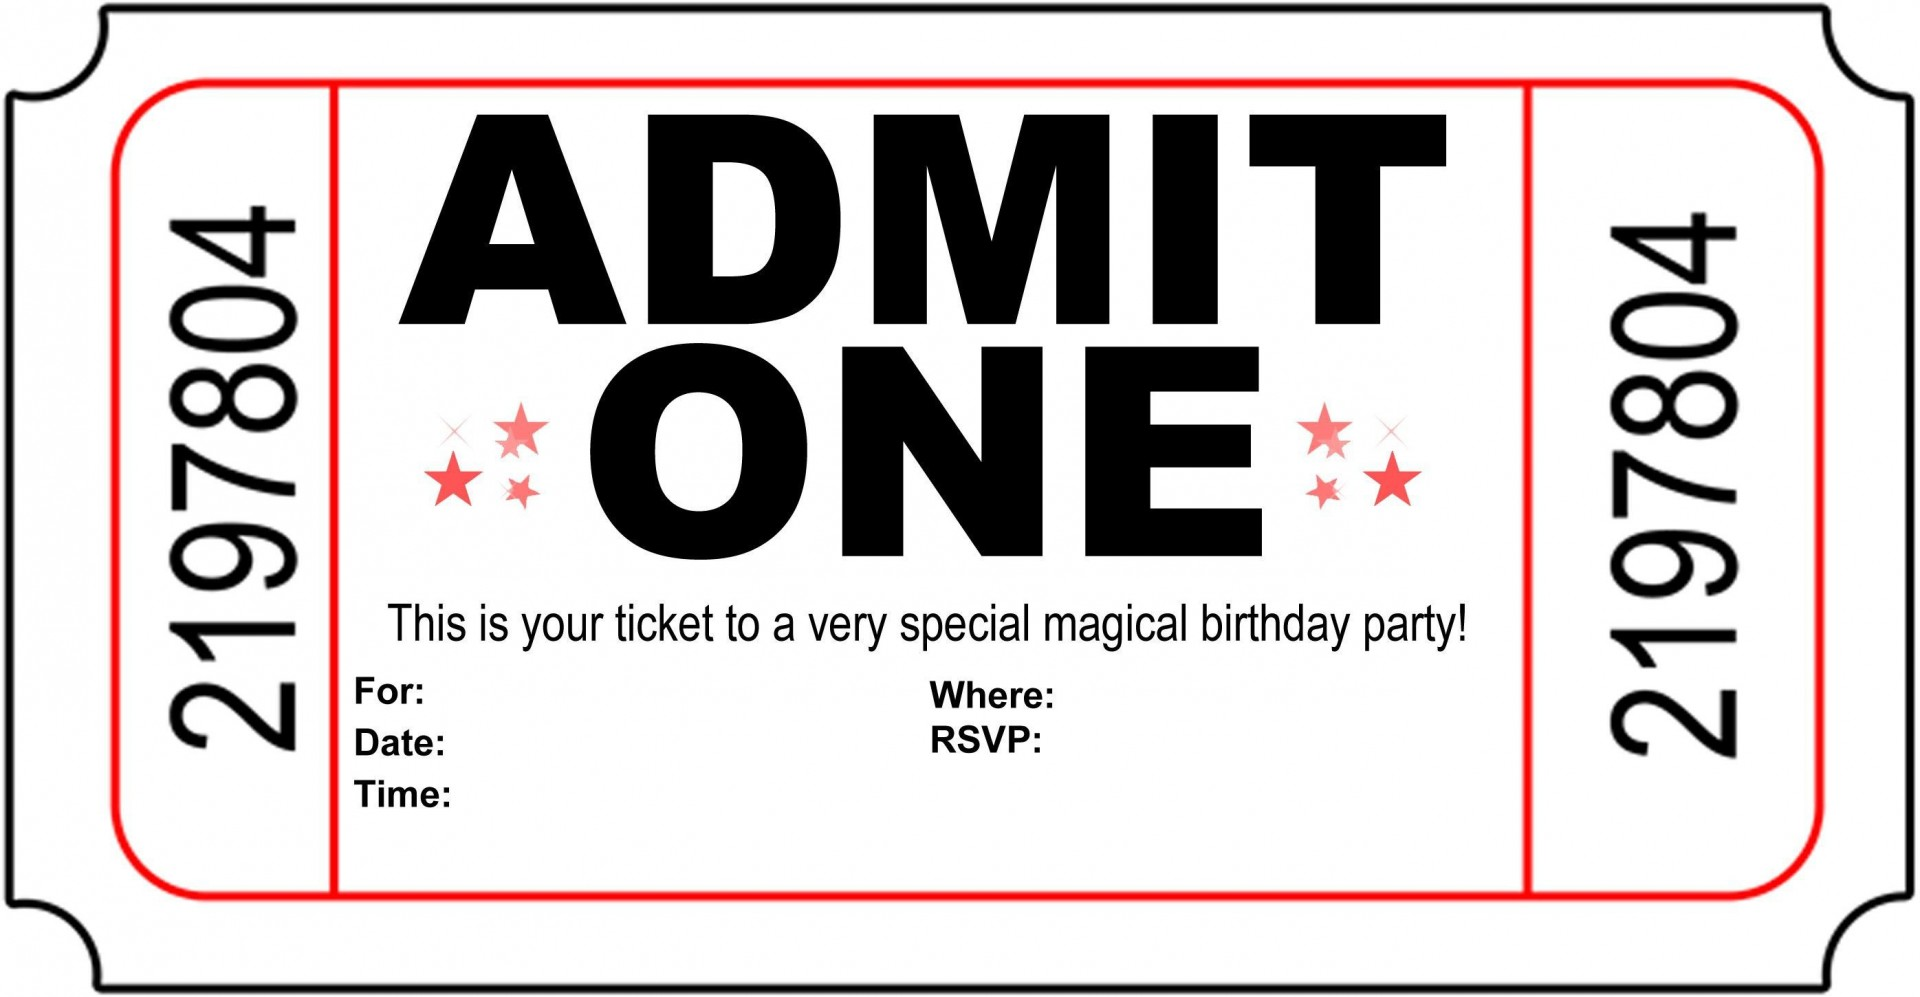 004 Astounding Free Printable Movie Ticket Birthday Party Invitation Inspiration 1920